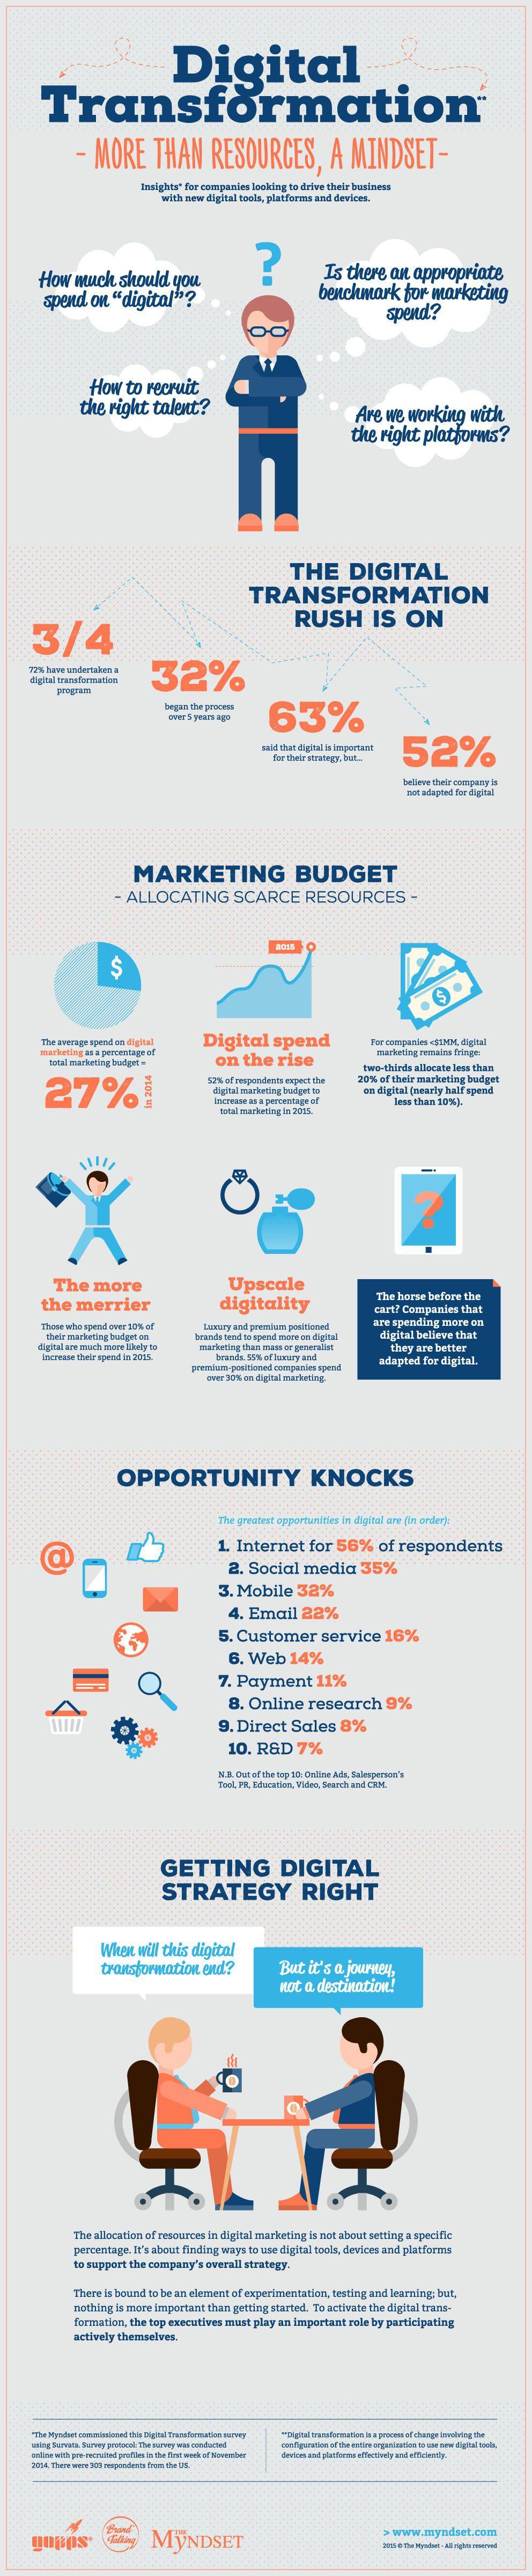 Digital Transformation Mindset